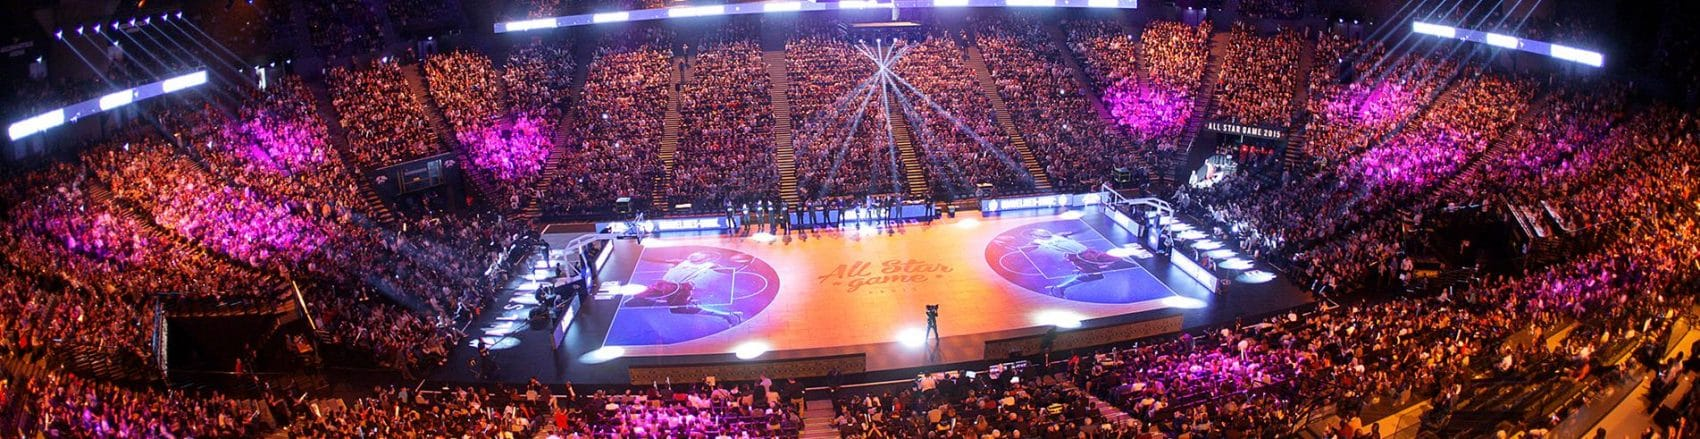 Gestion d'accès, monétisation & marketing Wi-Fi à l'AccorHotels Arena